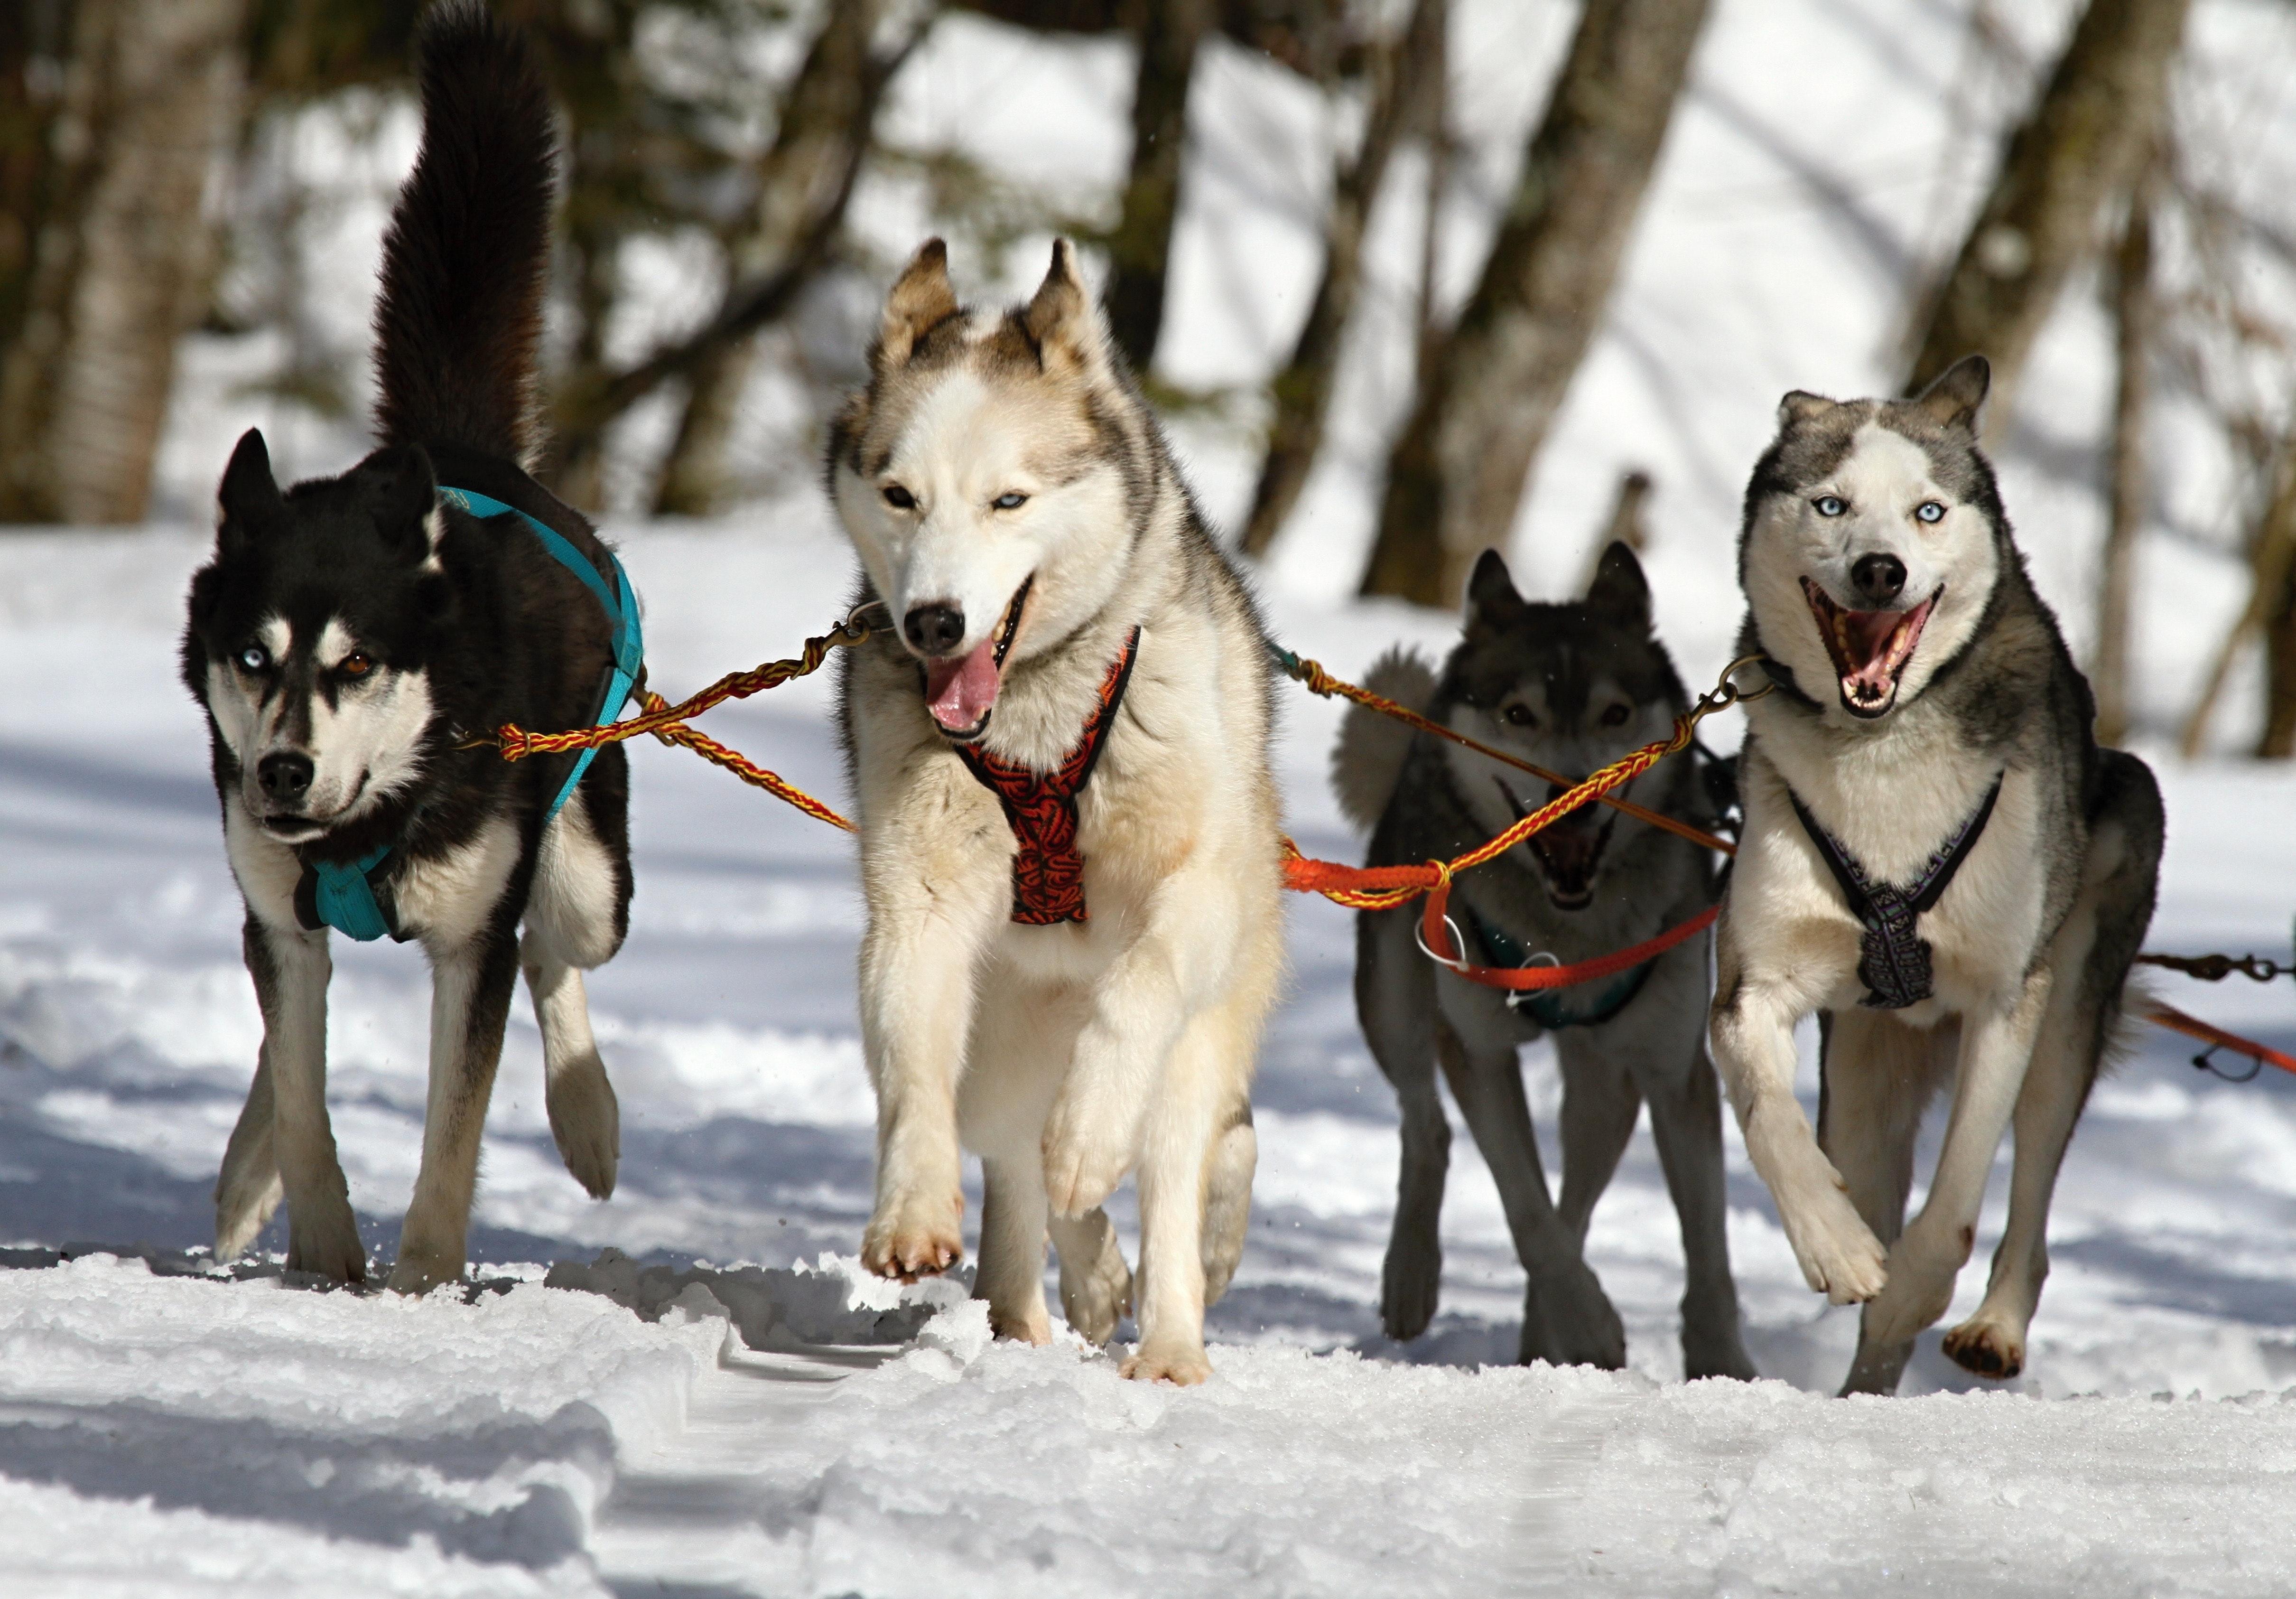 Huskeys driving sled through white snow photo